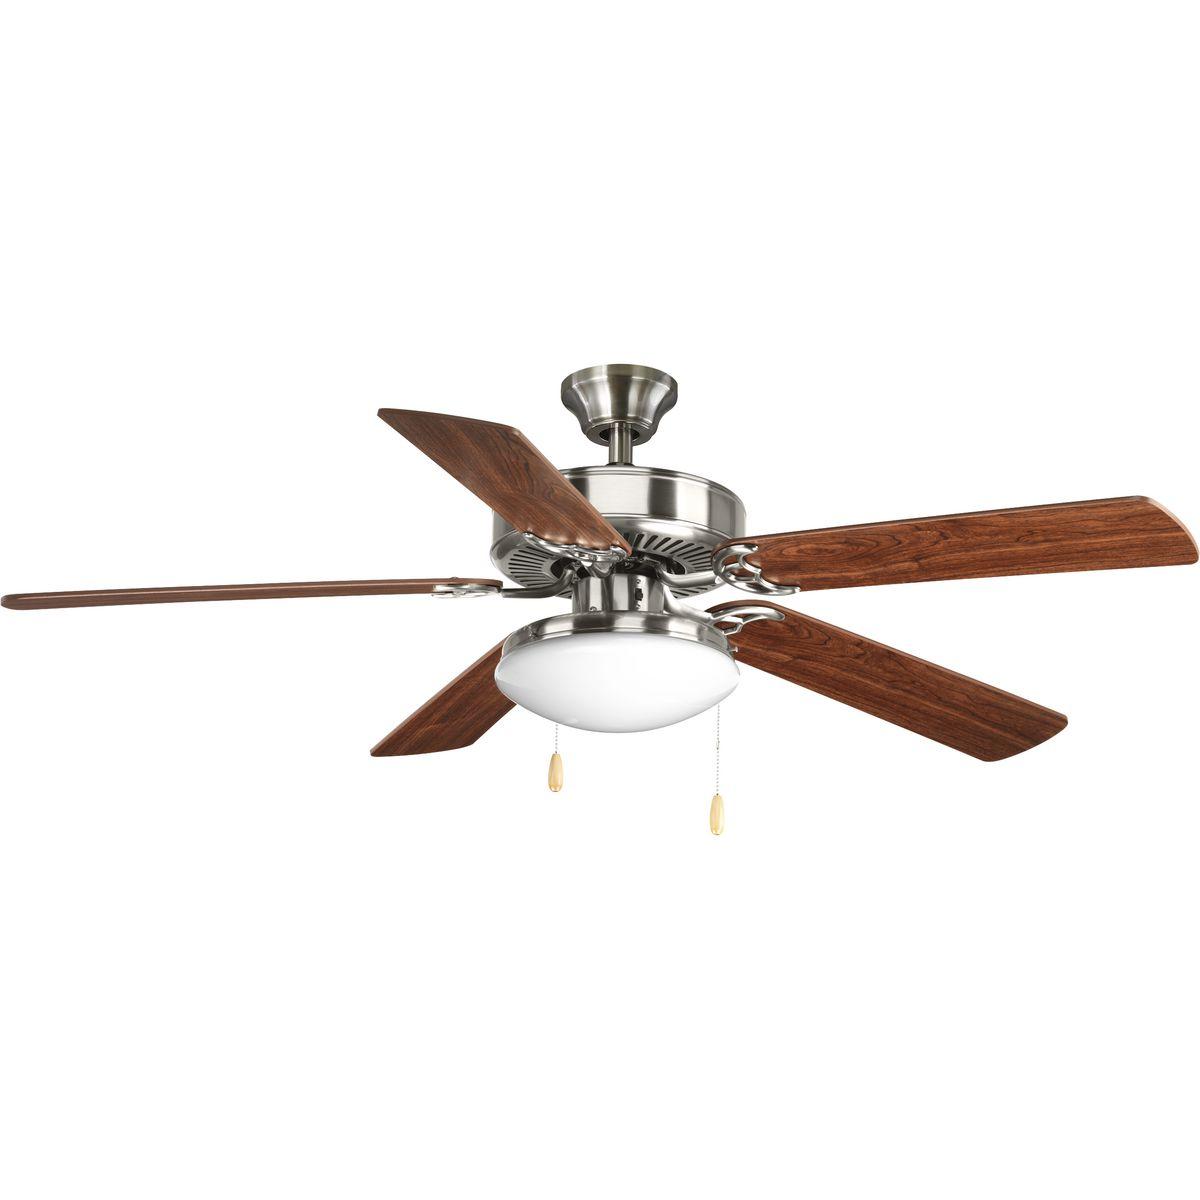 Airpro collection builder 52 5 blade ceiling fan brand progress progp250109wp260209prodimage aloadofball Choice Image